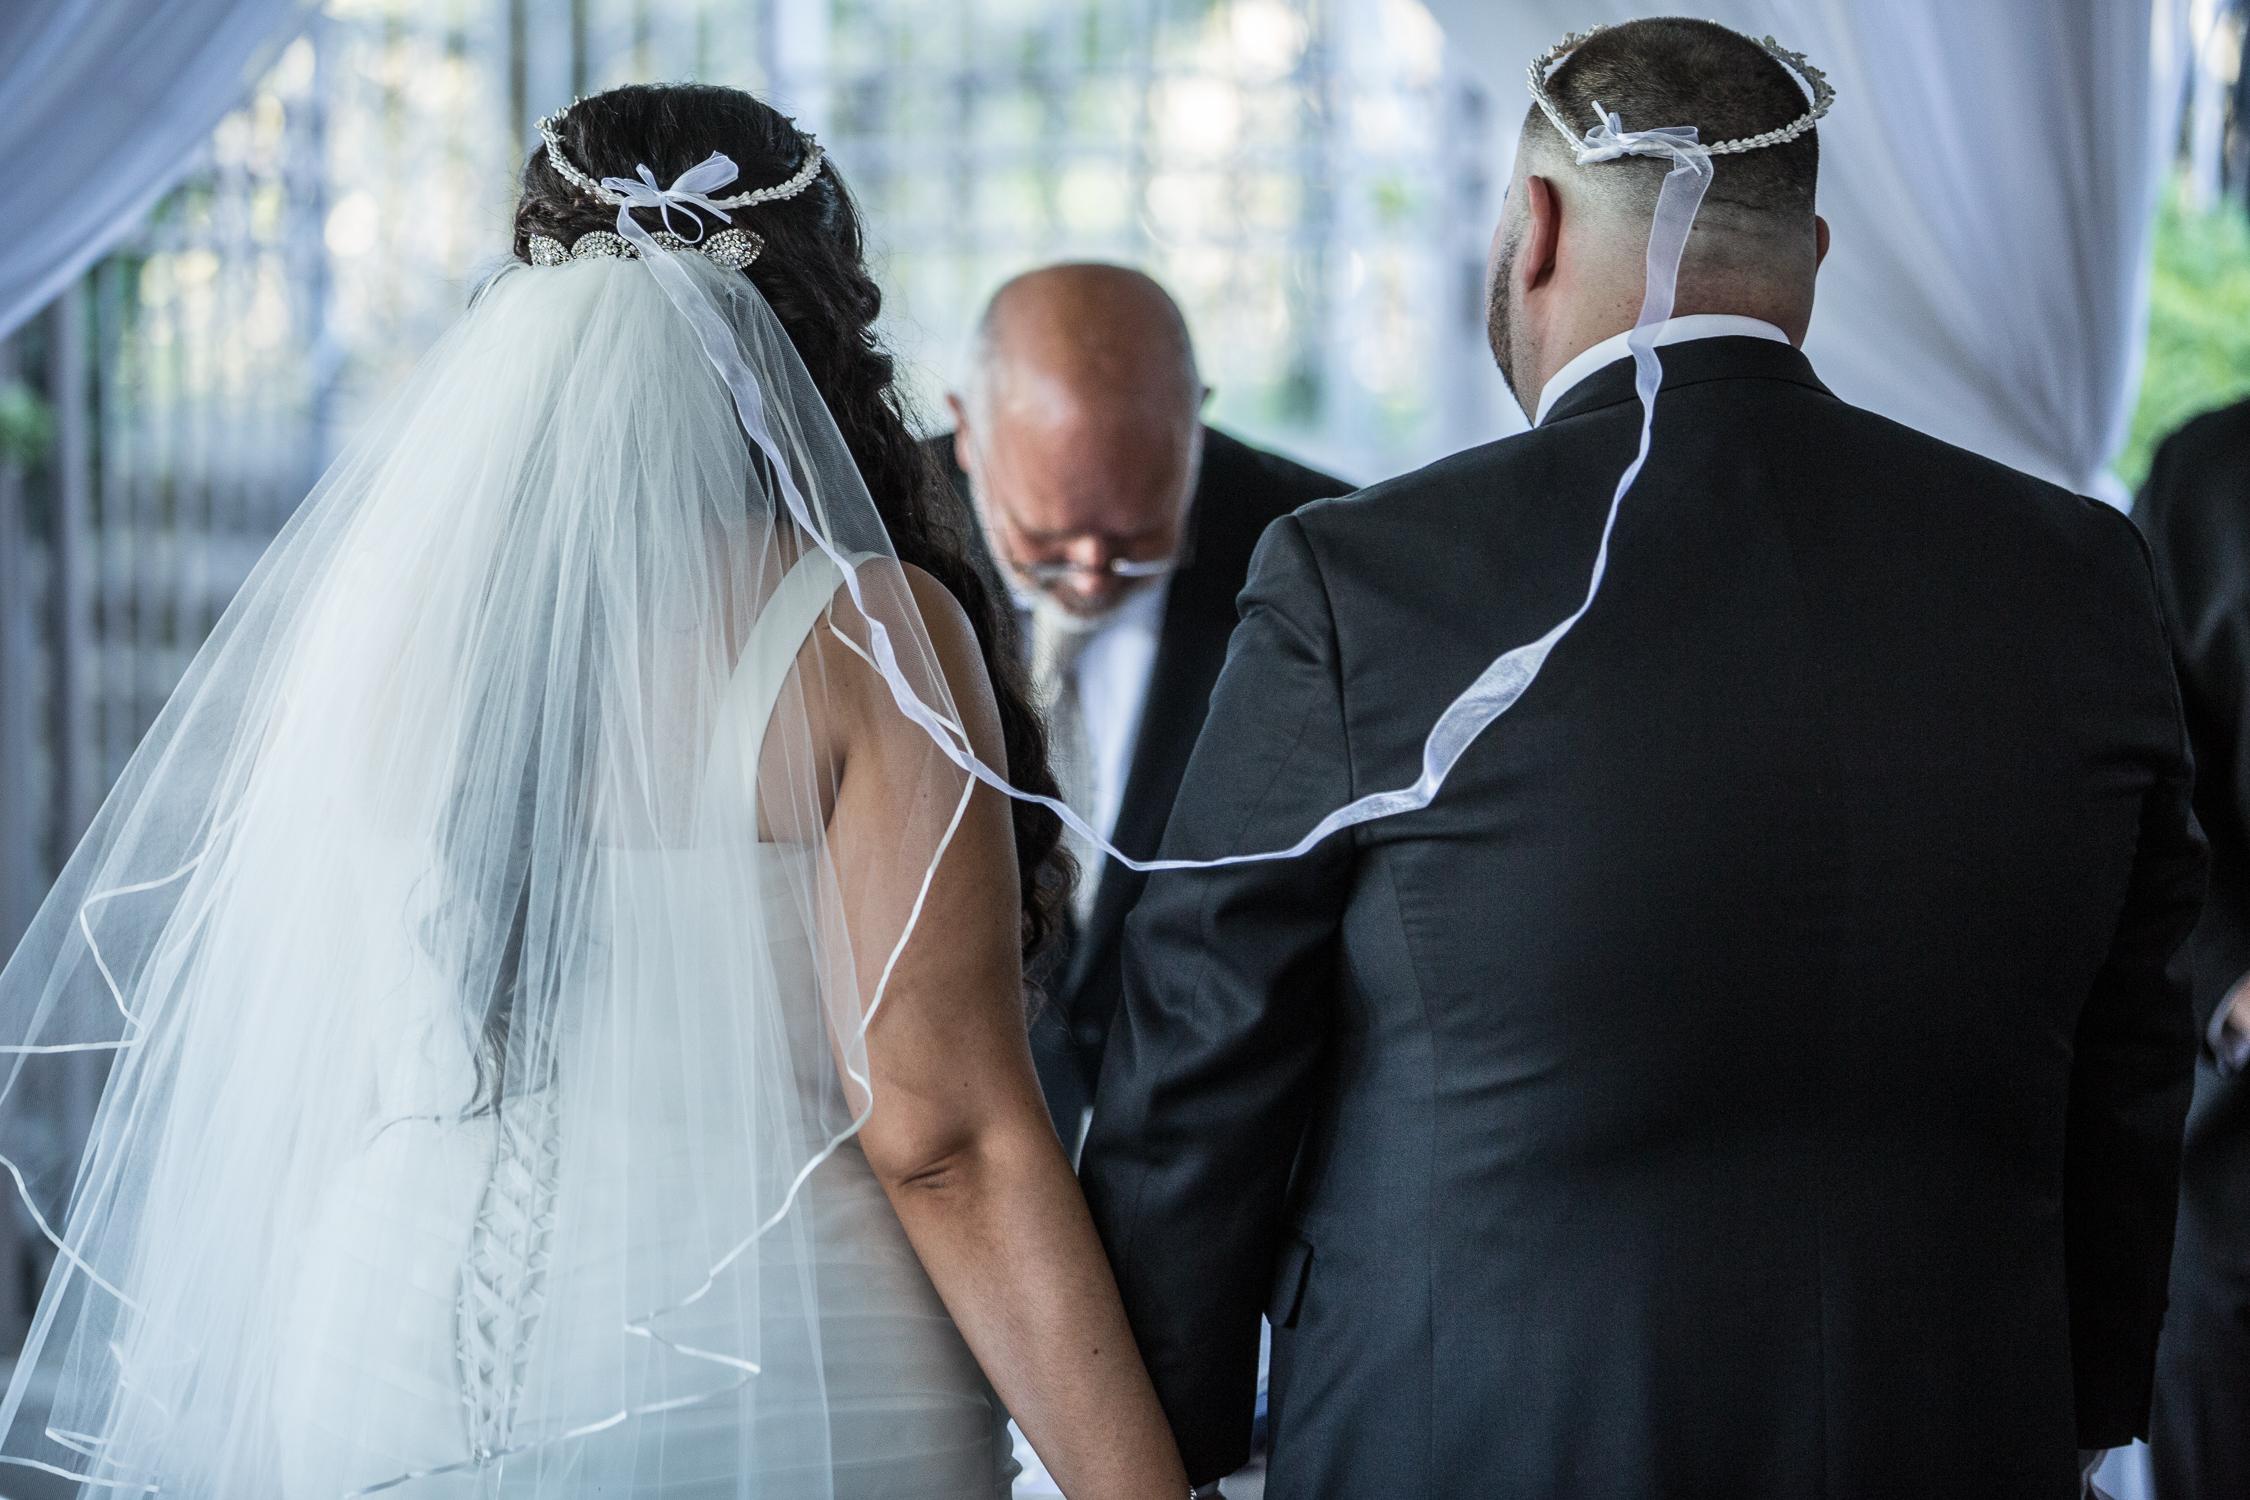 Peter-and-Marie-Wedding-Fontana-Primavera-Graydon-Hall-Manor-Toronto-Ontario-Canada-0040.jpg